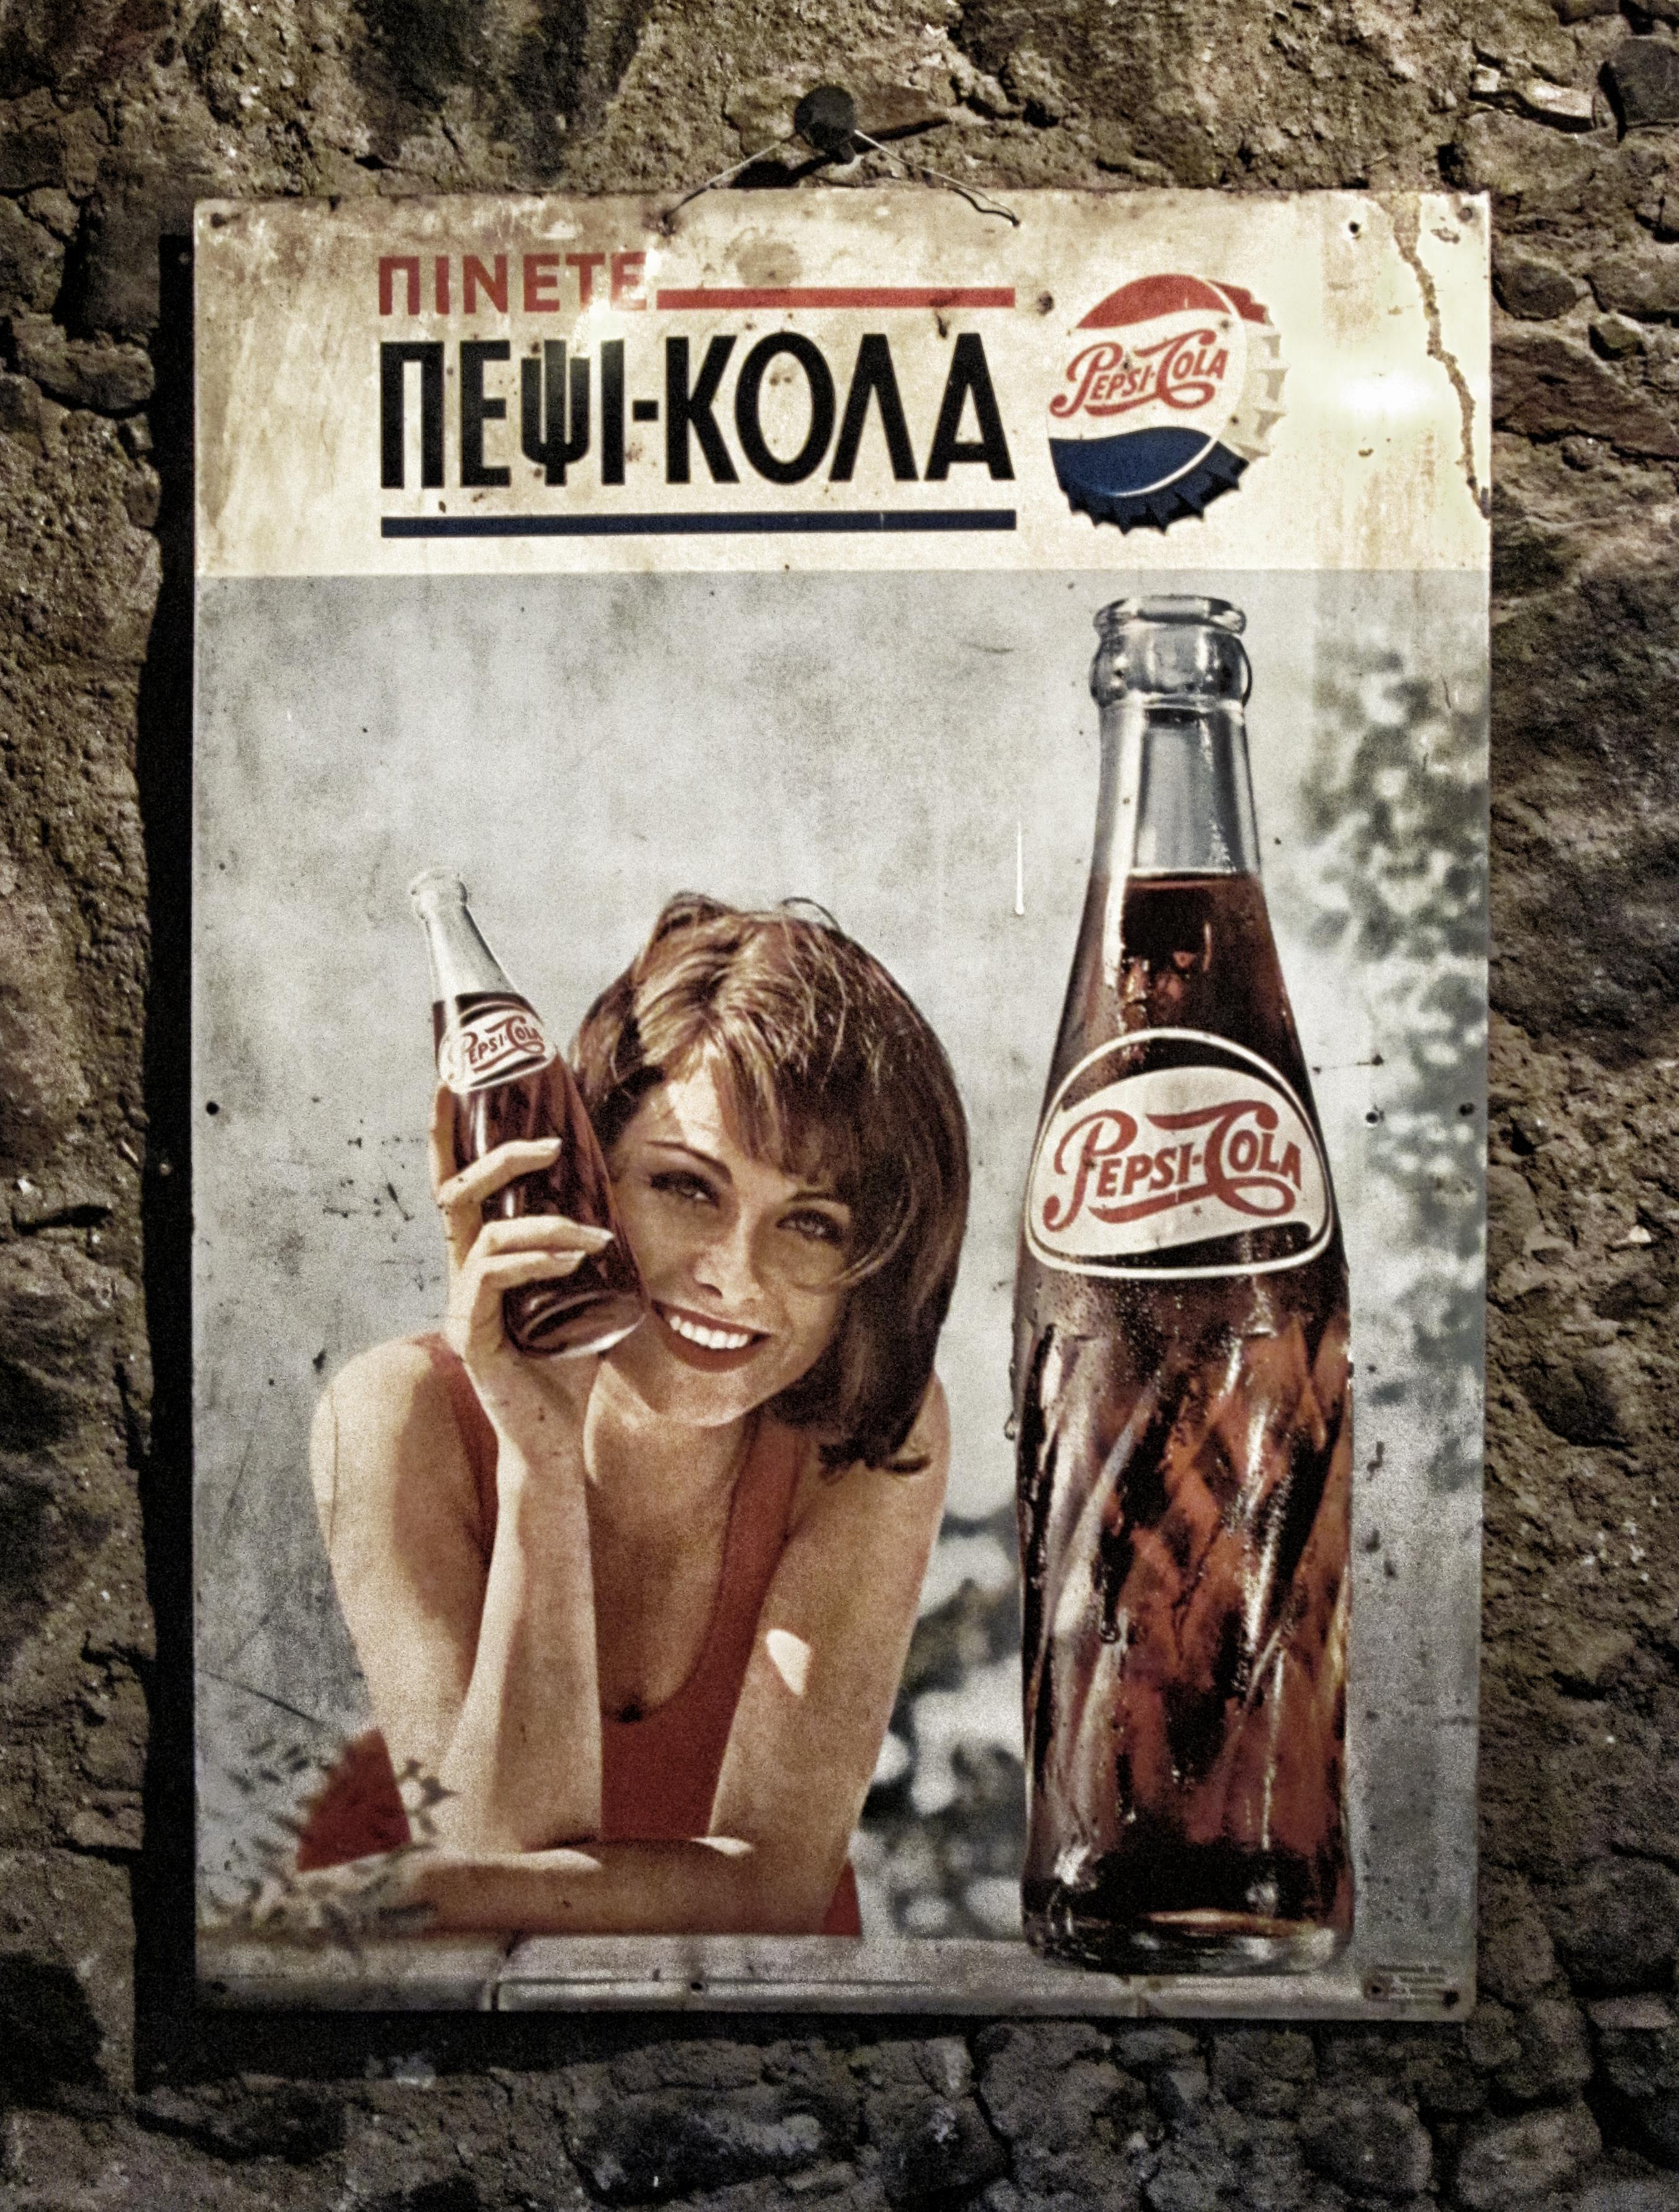 http://fc02.deviantart.net/fs71/f/2012/176/0/b/drink_pepsi_cola_vintage_ad_by_tntiseverywere-d54sqvh.jpg